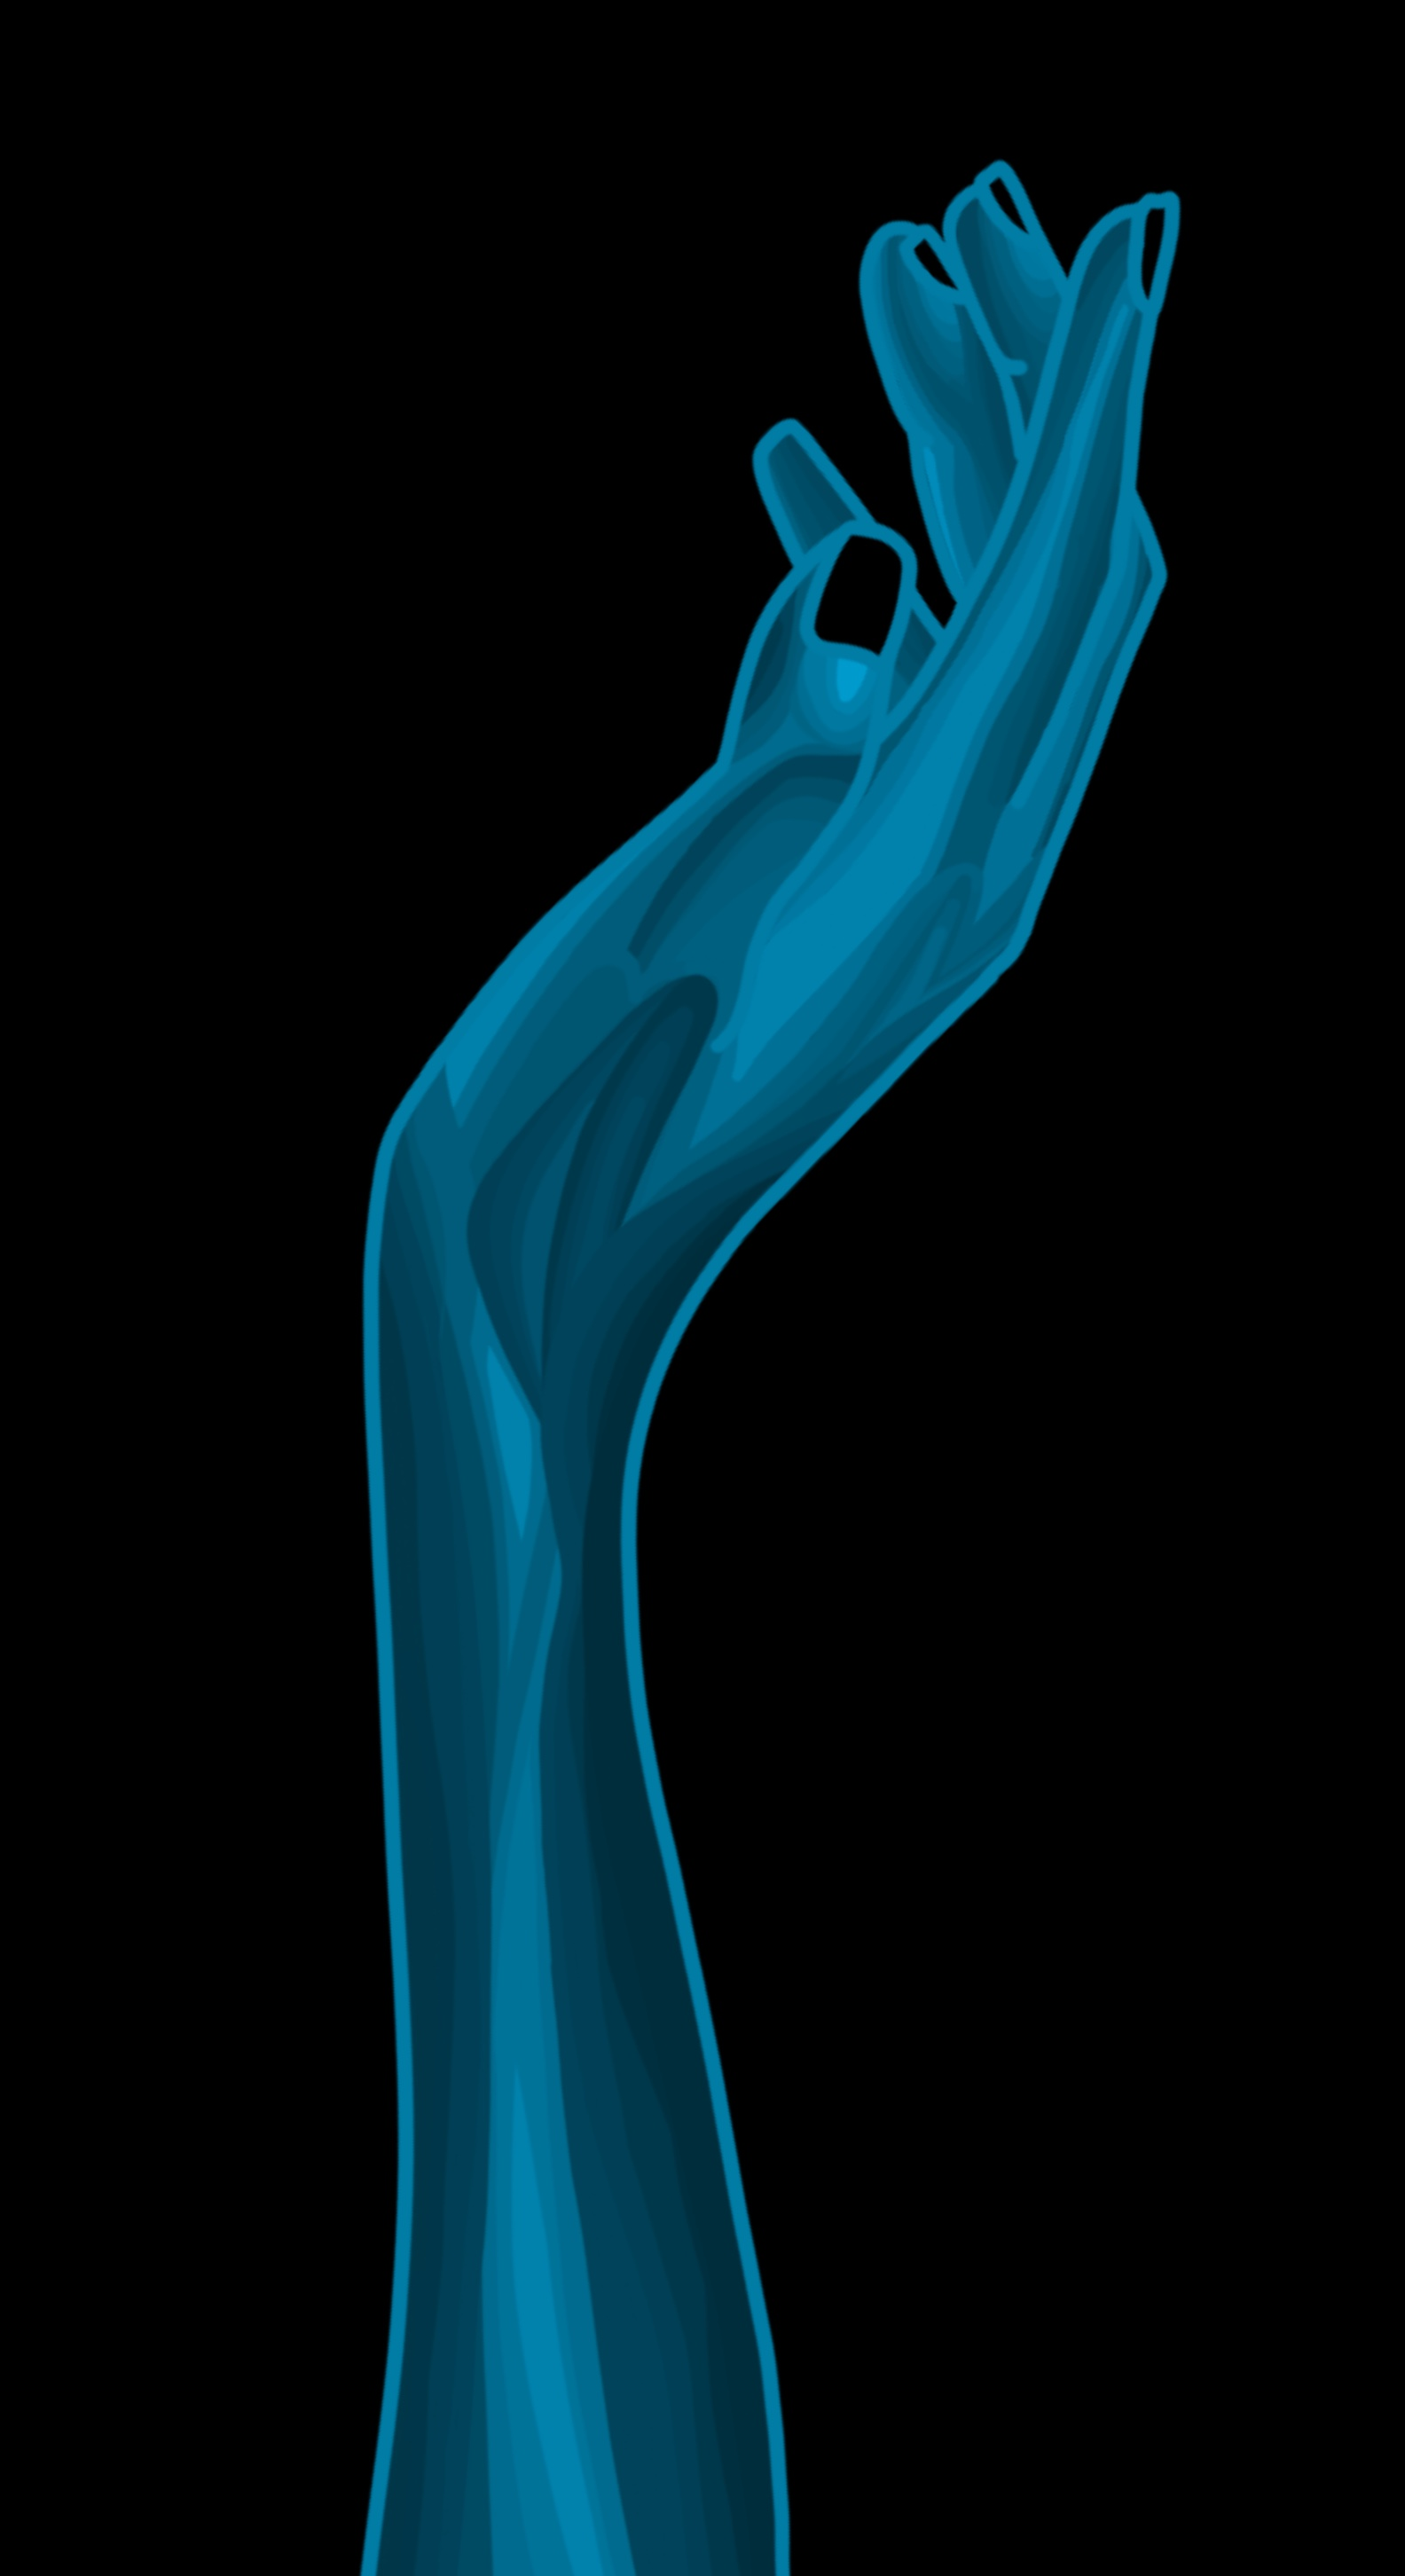 Turquoise_.jpg